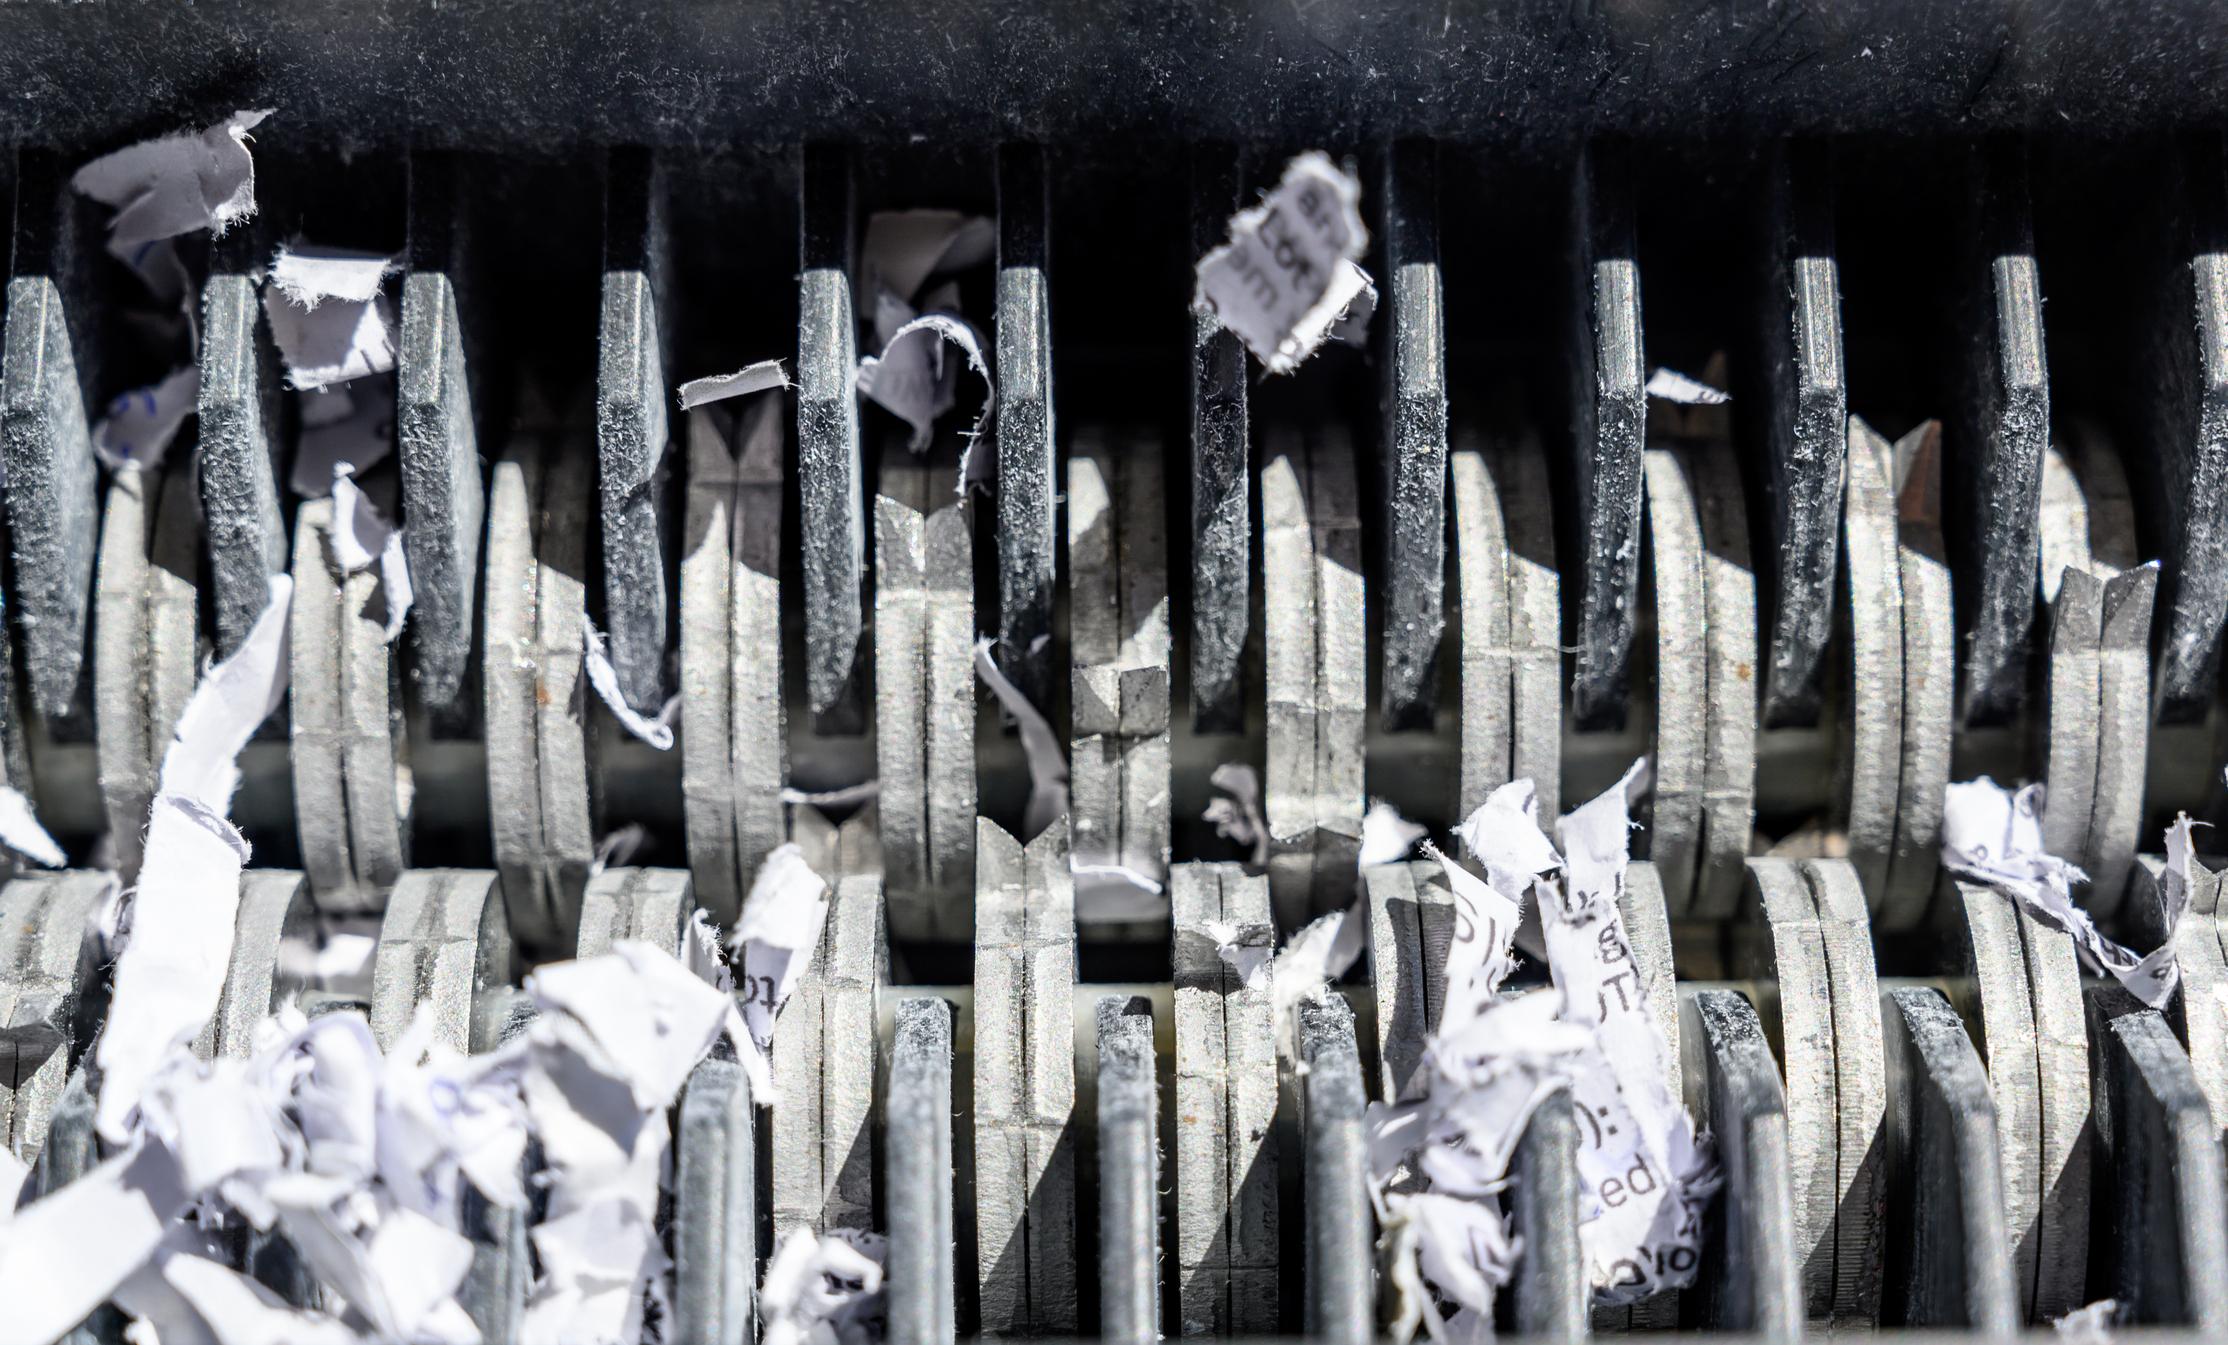 Mobile Paper Shredding Services